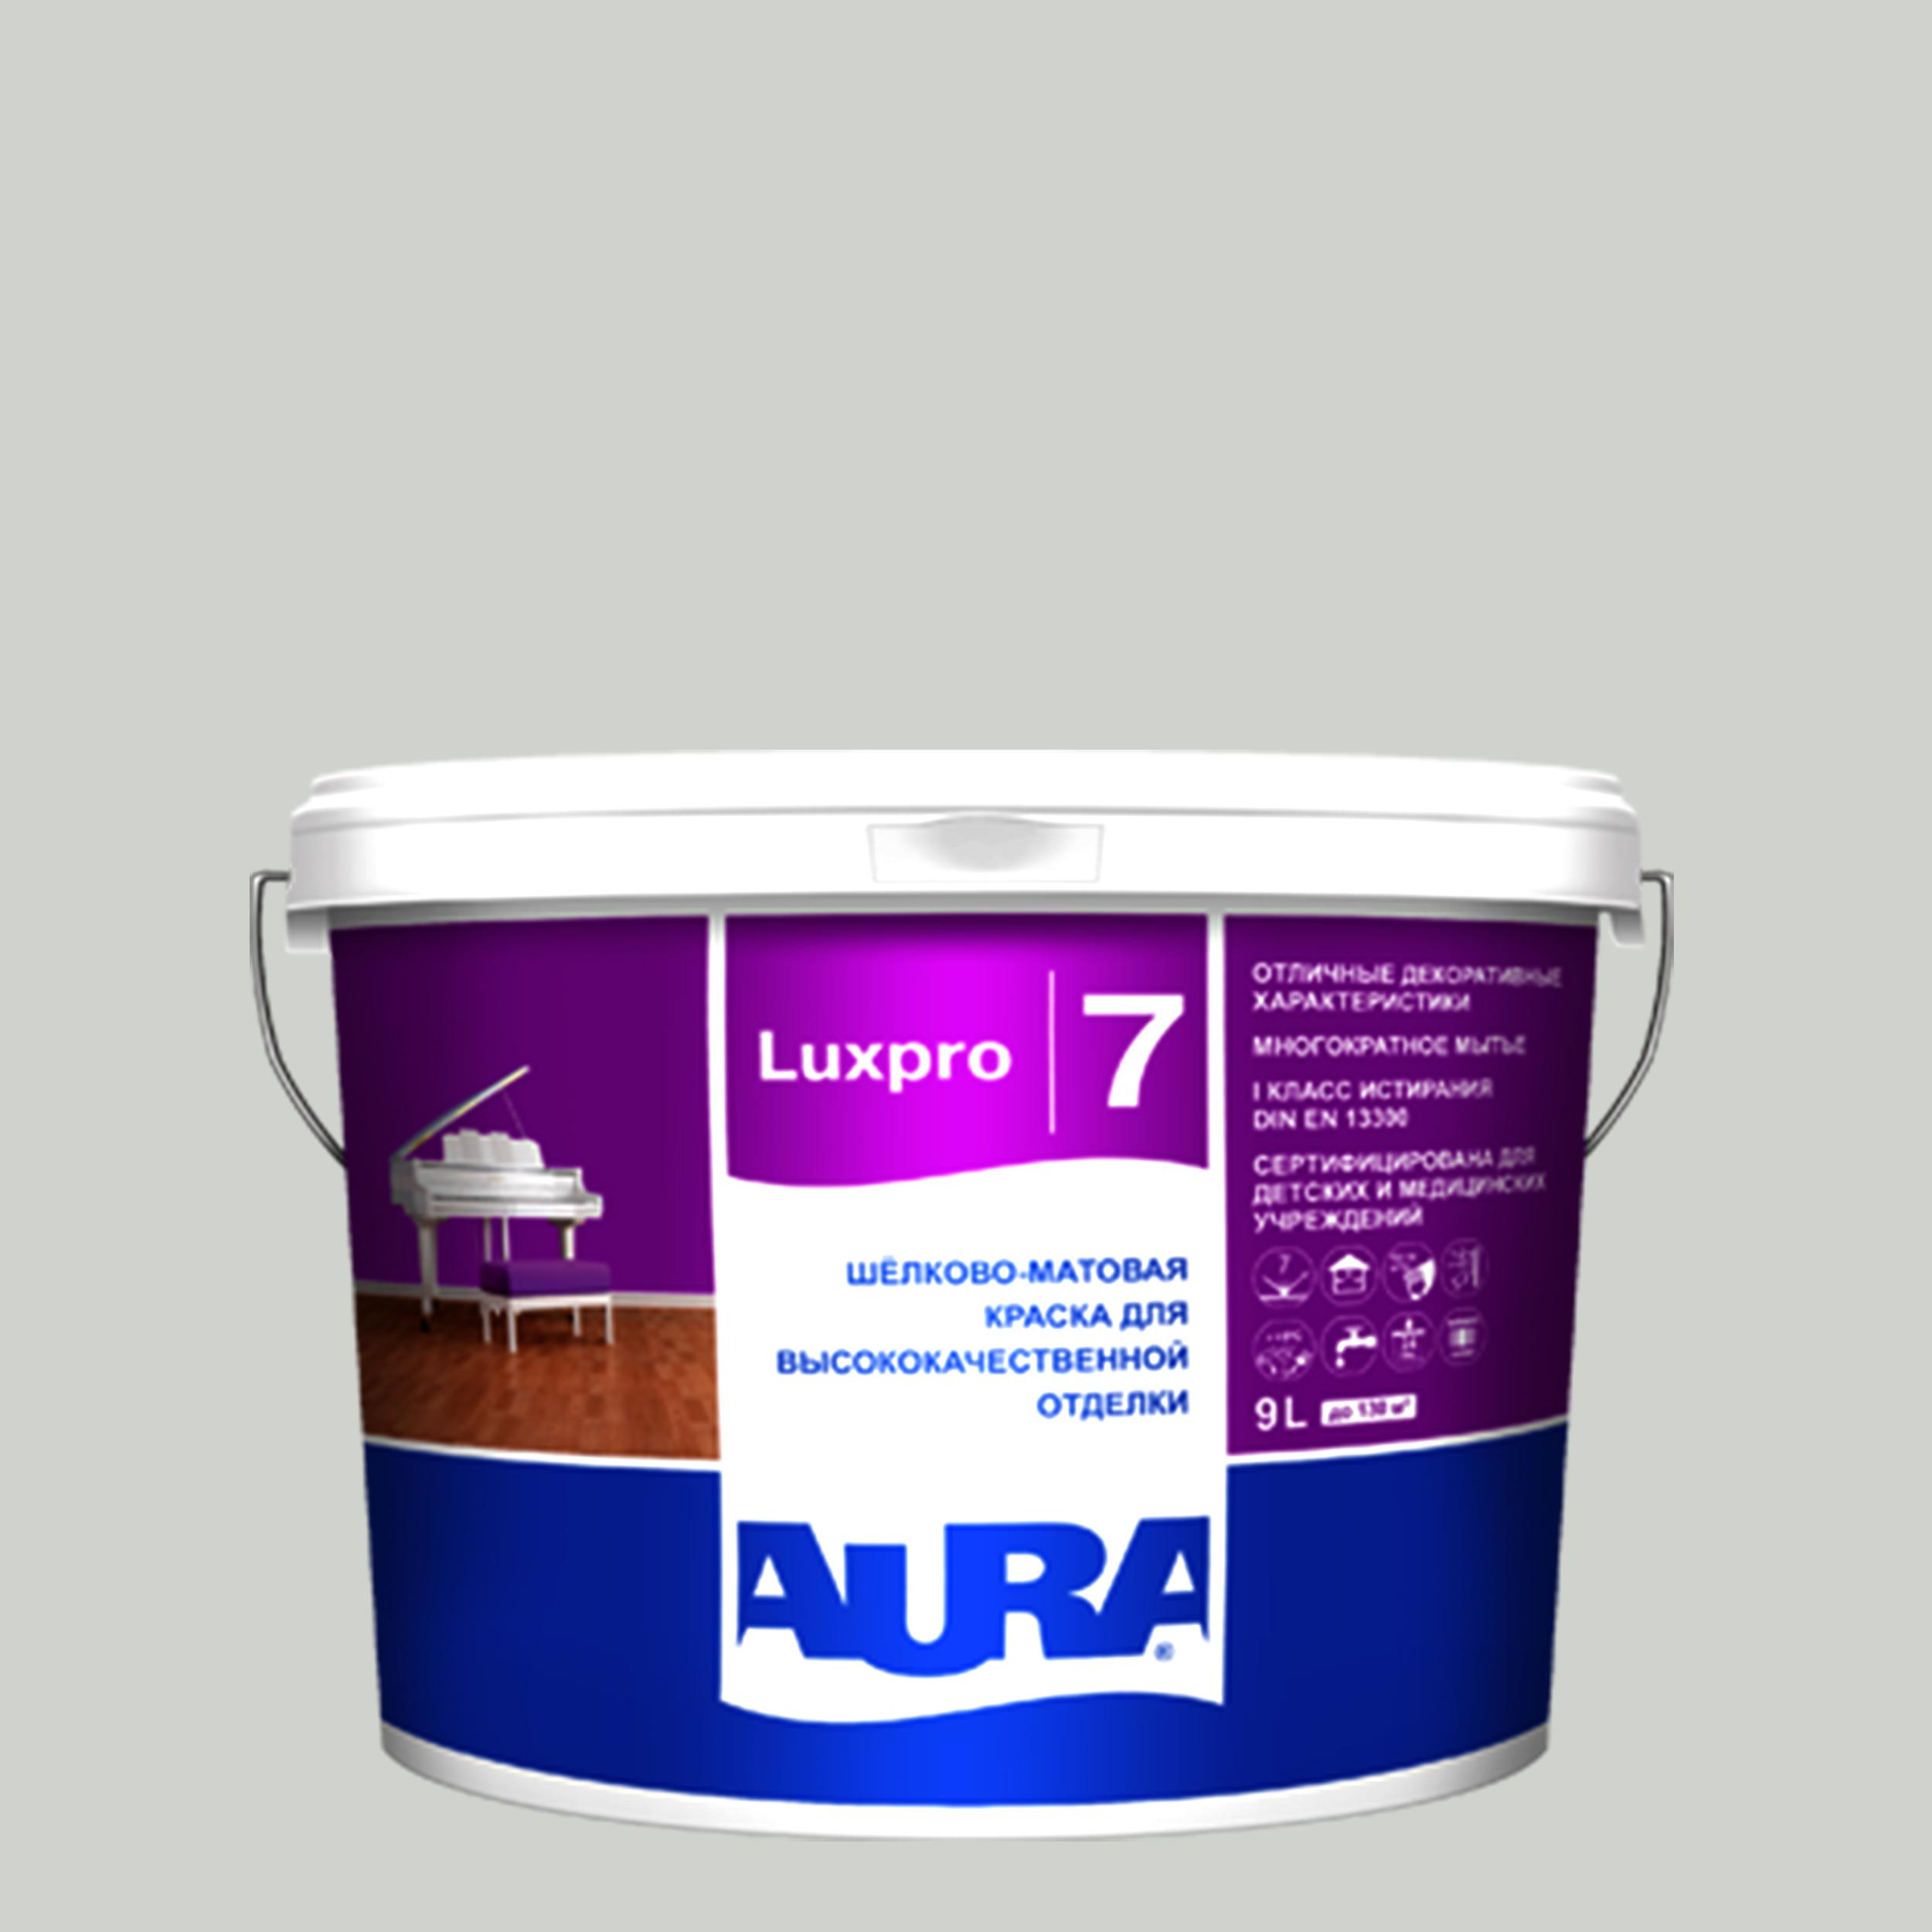 Фото 4 - Краска интерьерная, Aura LuxPRO 7, RAL 9011, 11 кг.